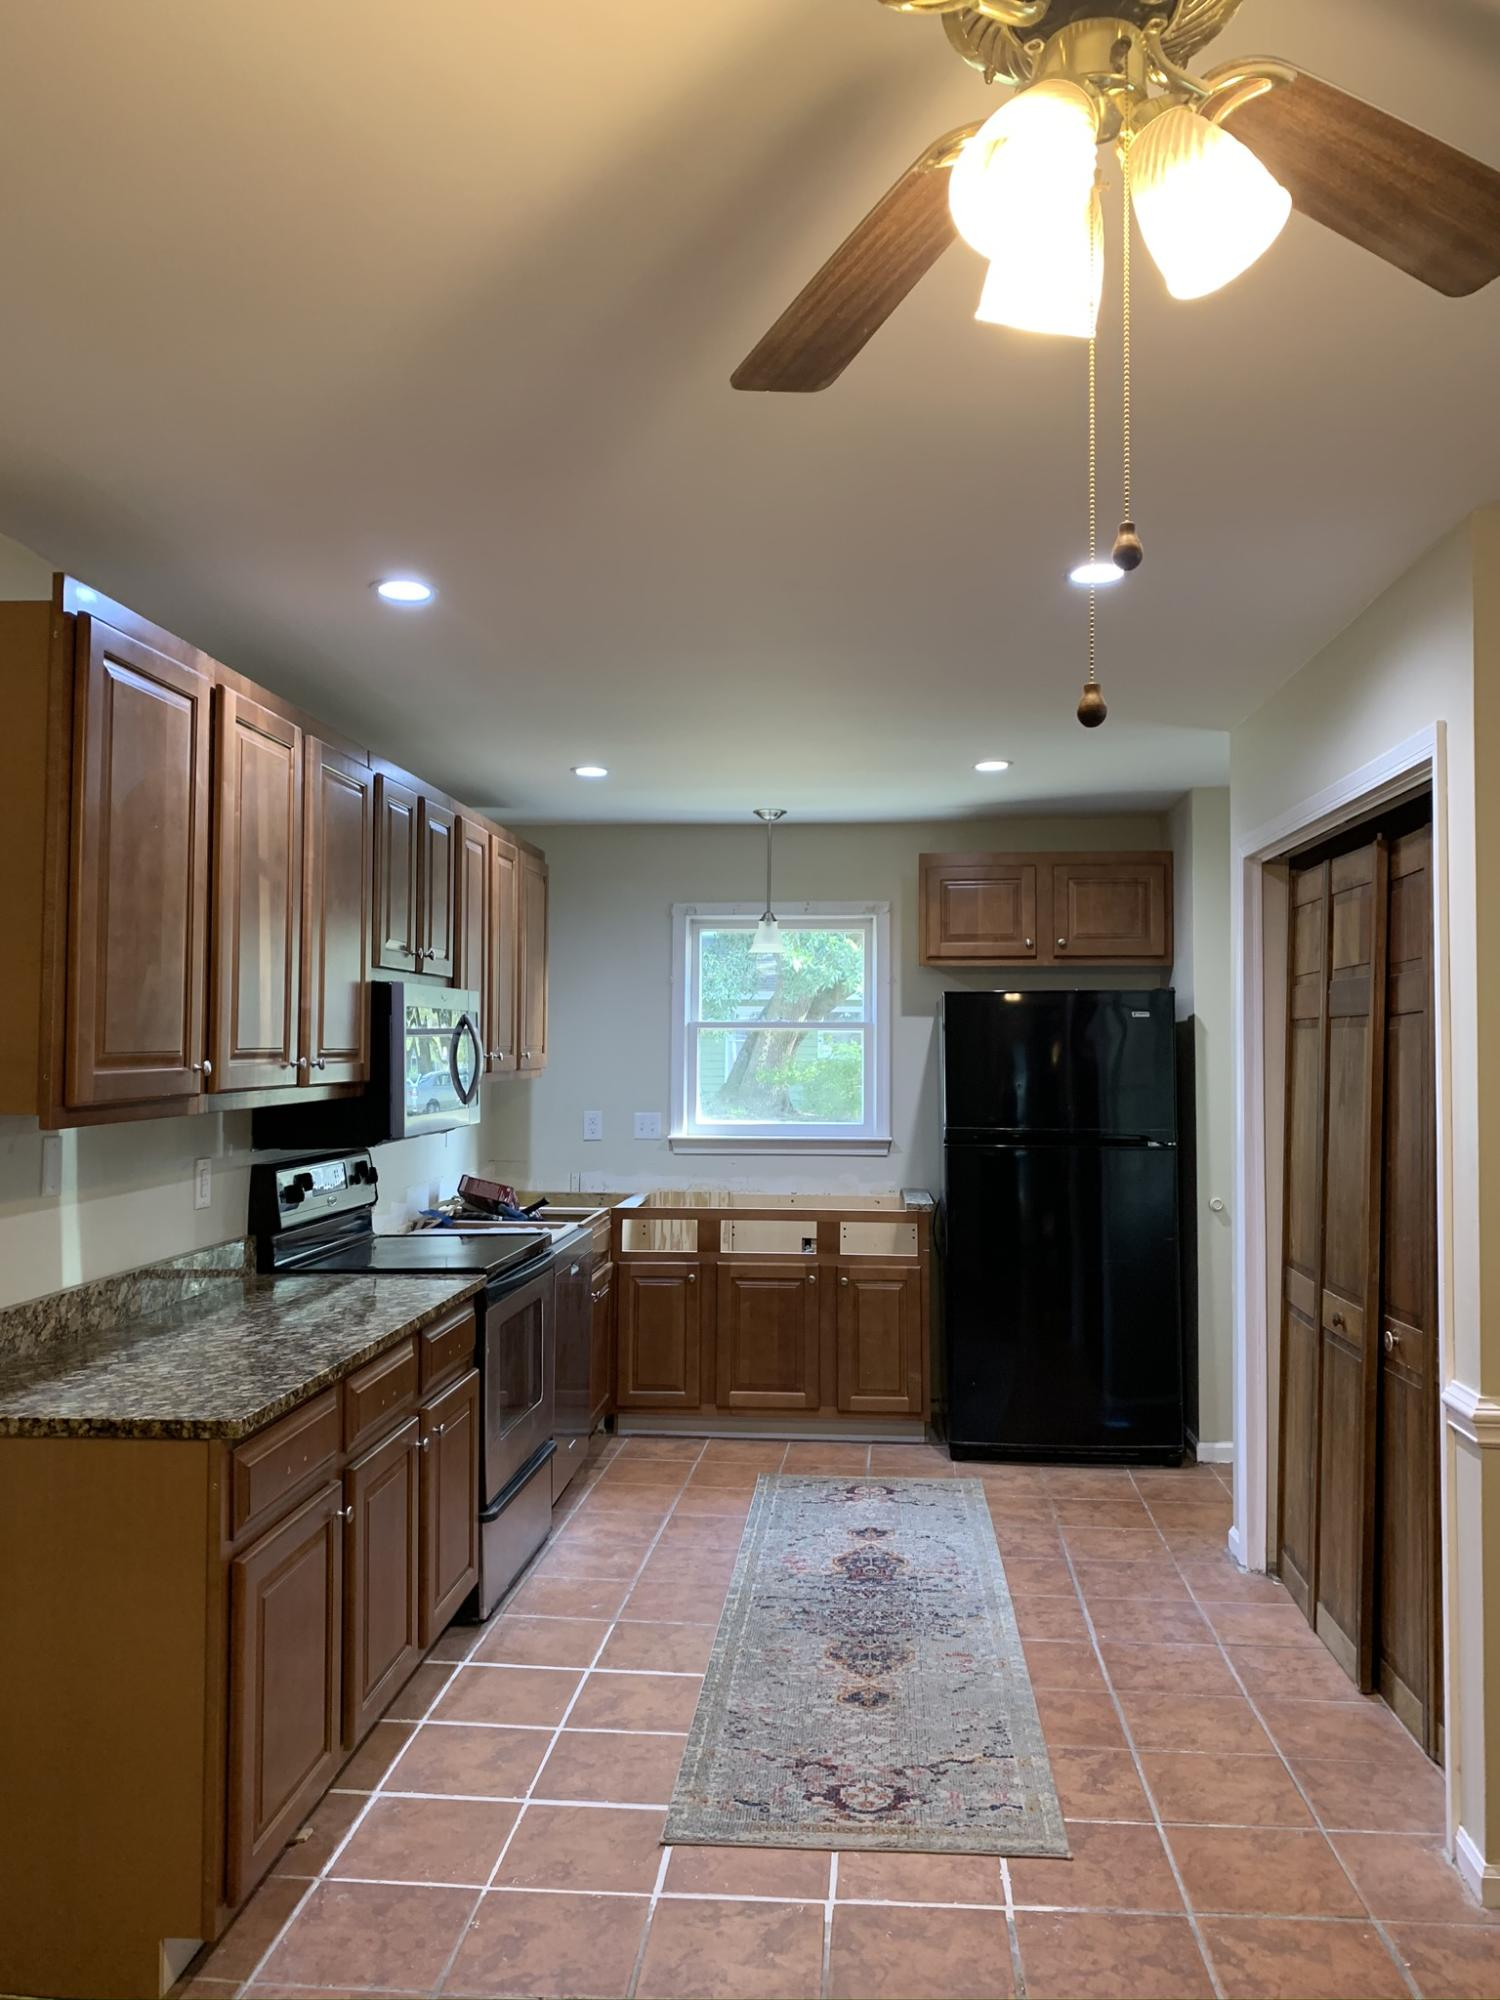 Fox Pond Homes For Sale - 662 Poaug, Mount Pleasant, SC - 9